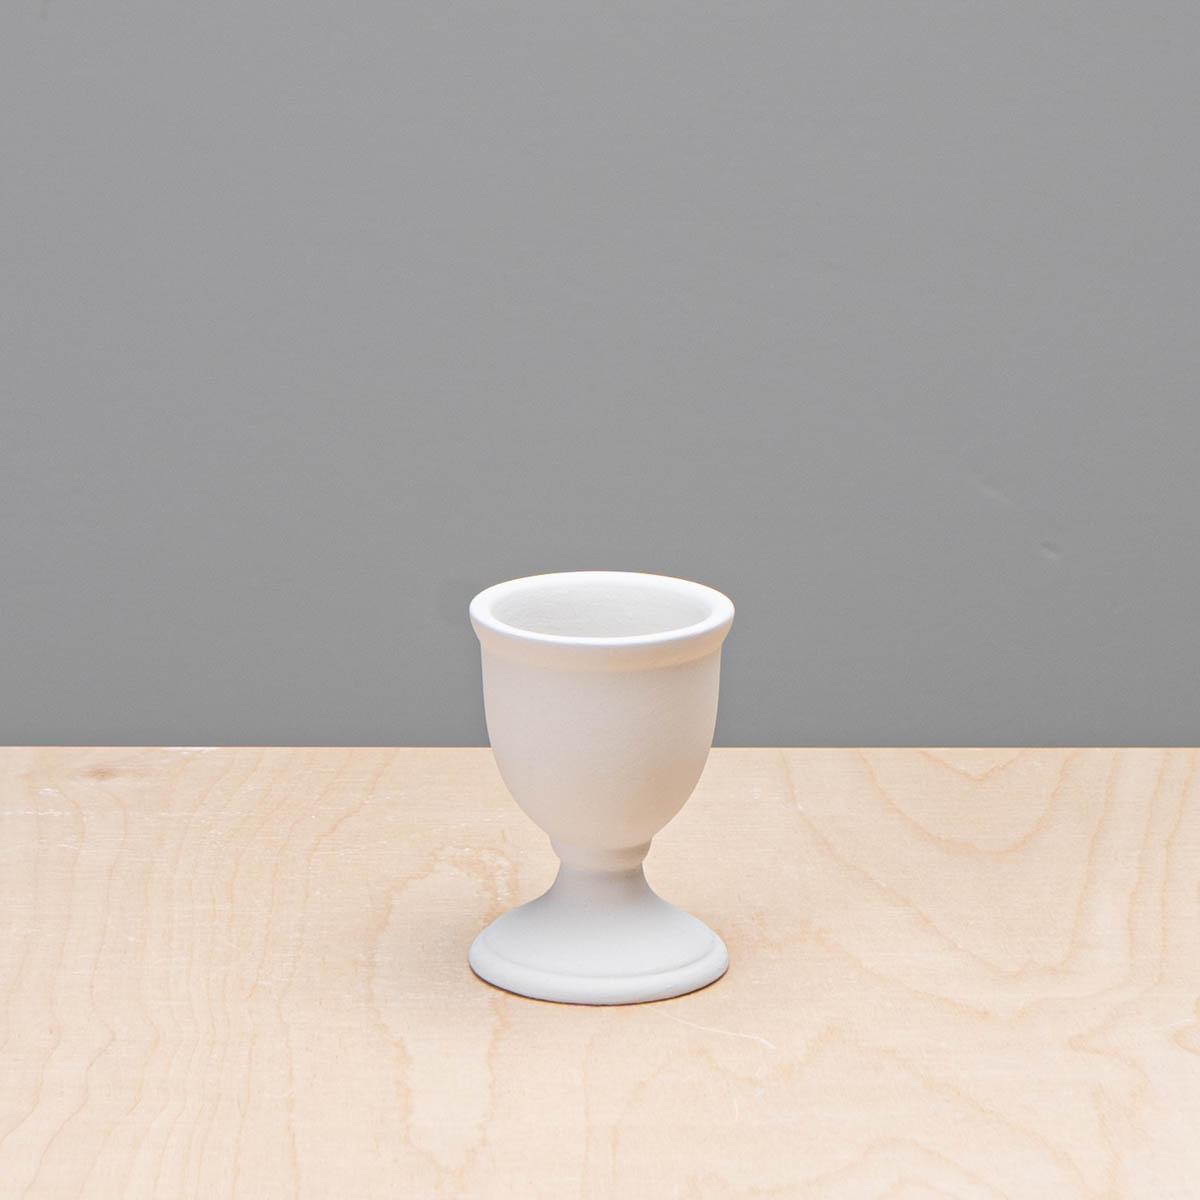 keramikpost-produkt-273